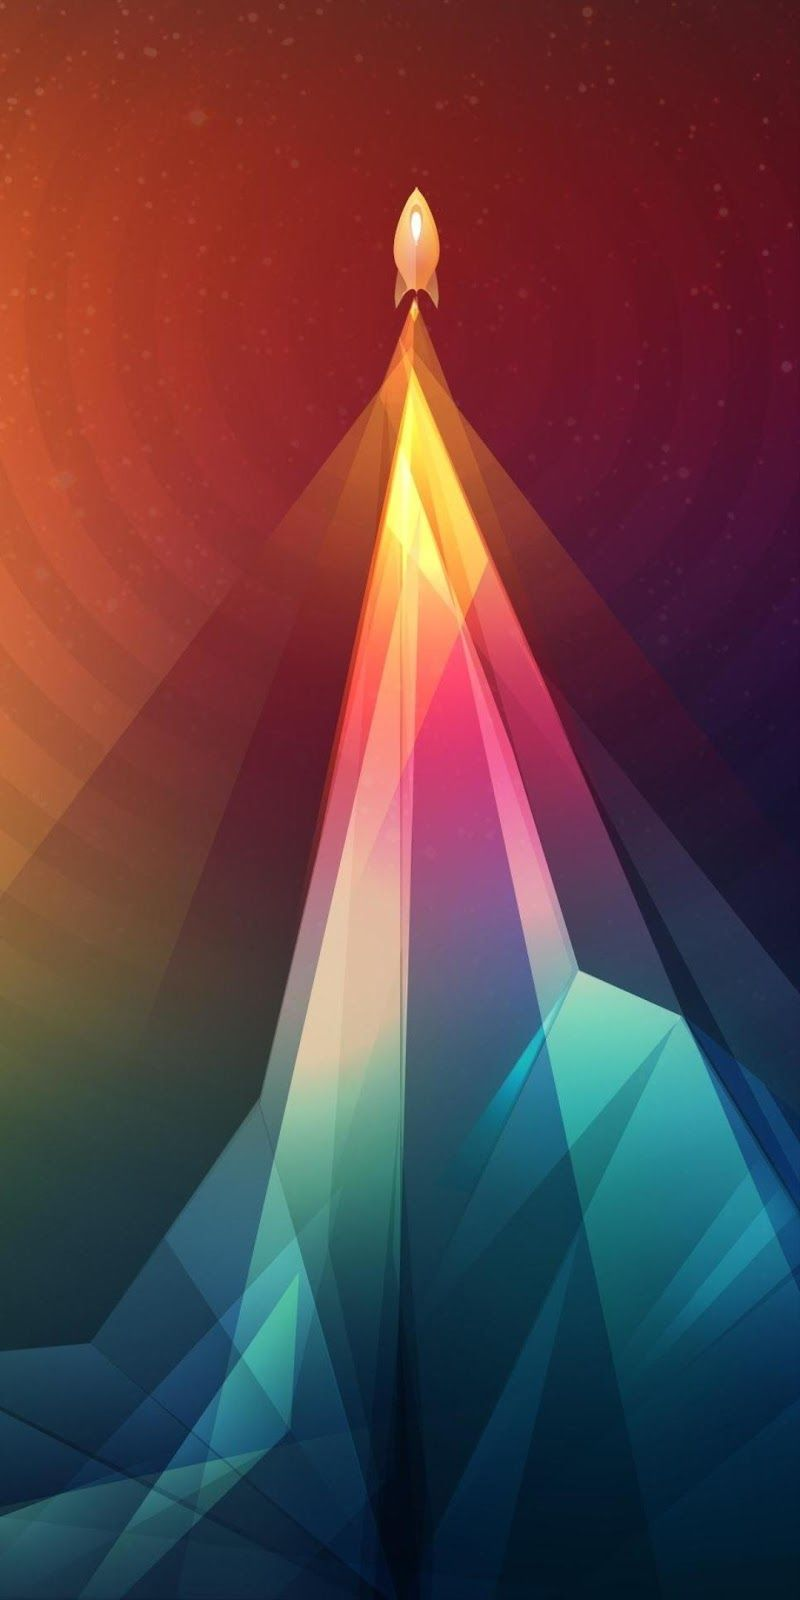 Colorful Rocket Launch Cool Wallpaper Rainbow Beautiful Nature